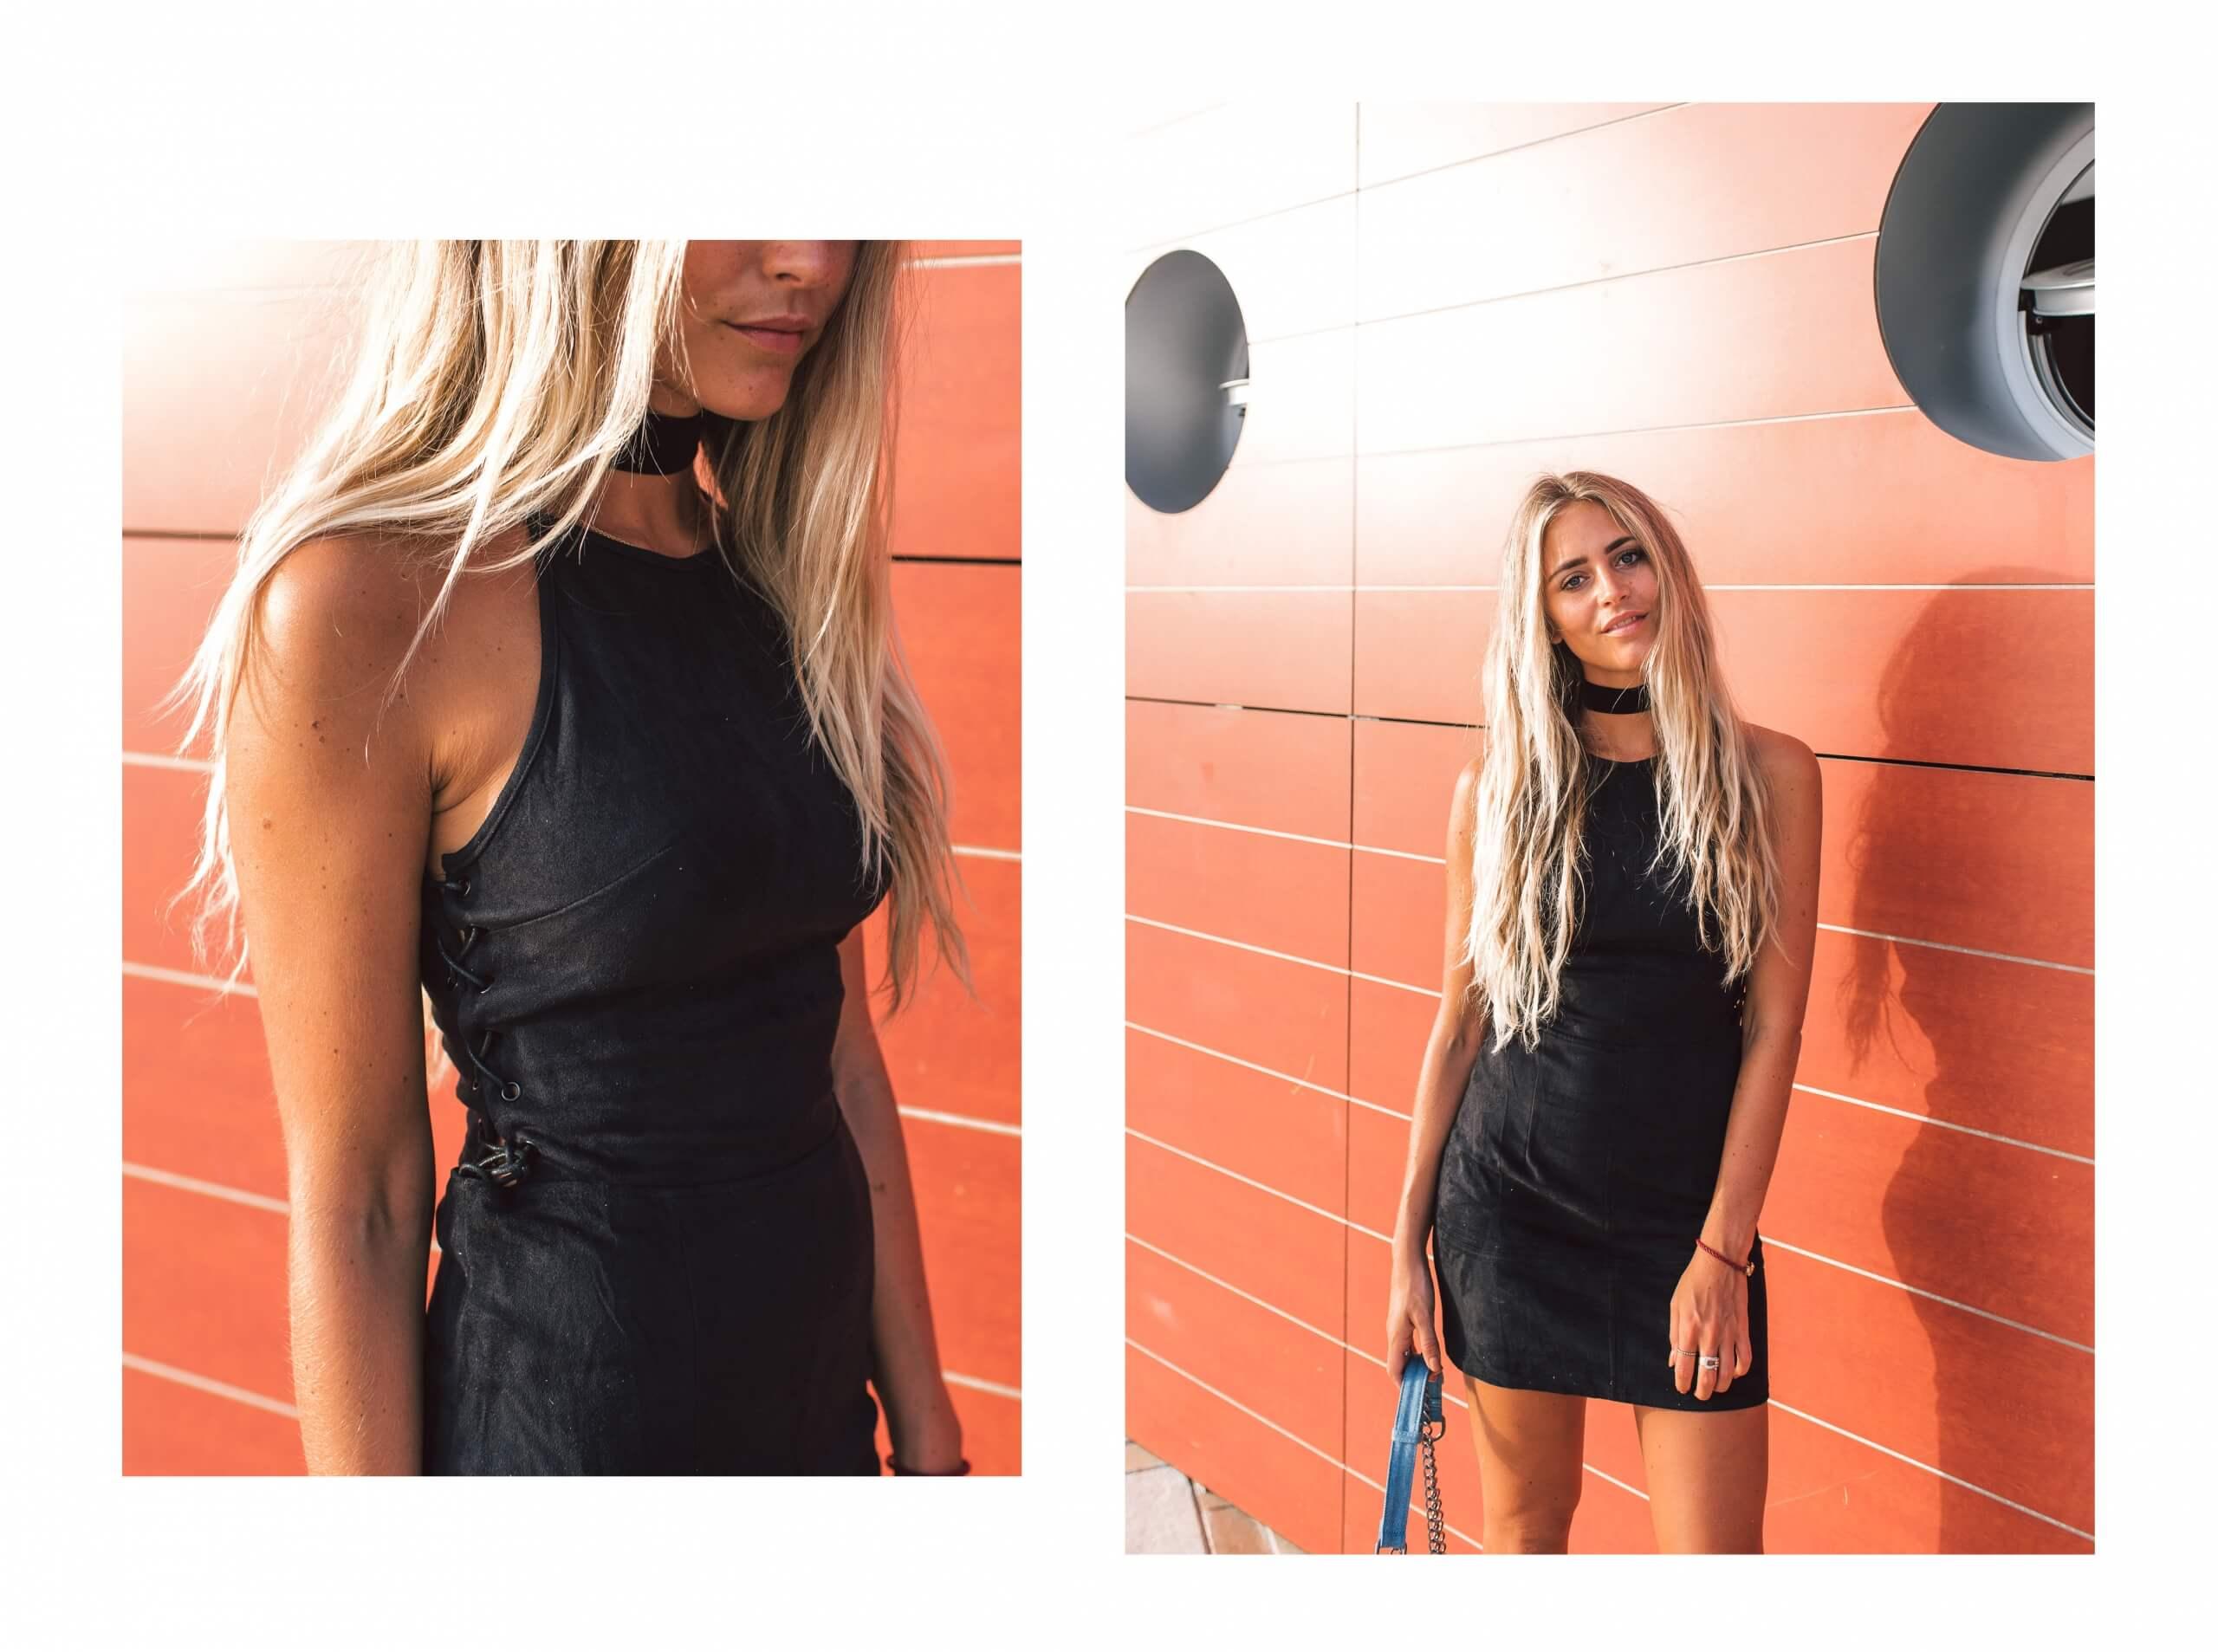 janni-deler-black-on-black-senso-na-kdDSC_9117-Redigera copy